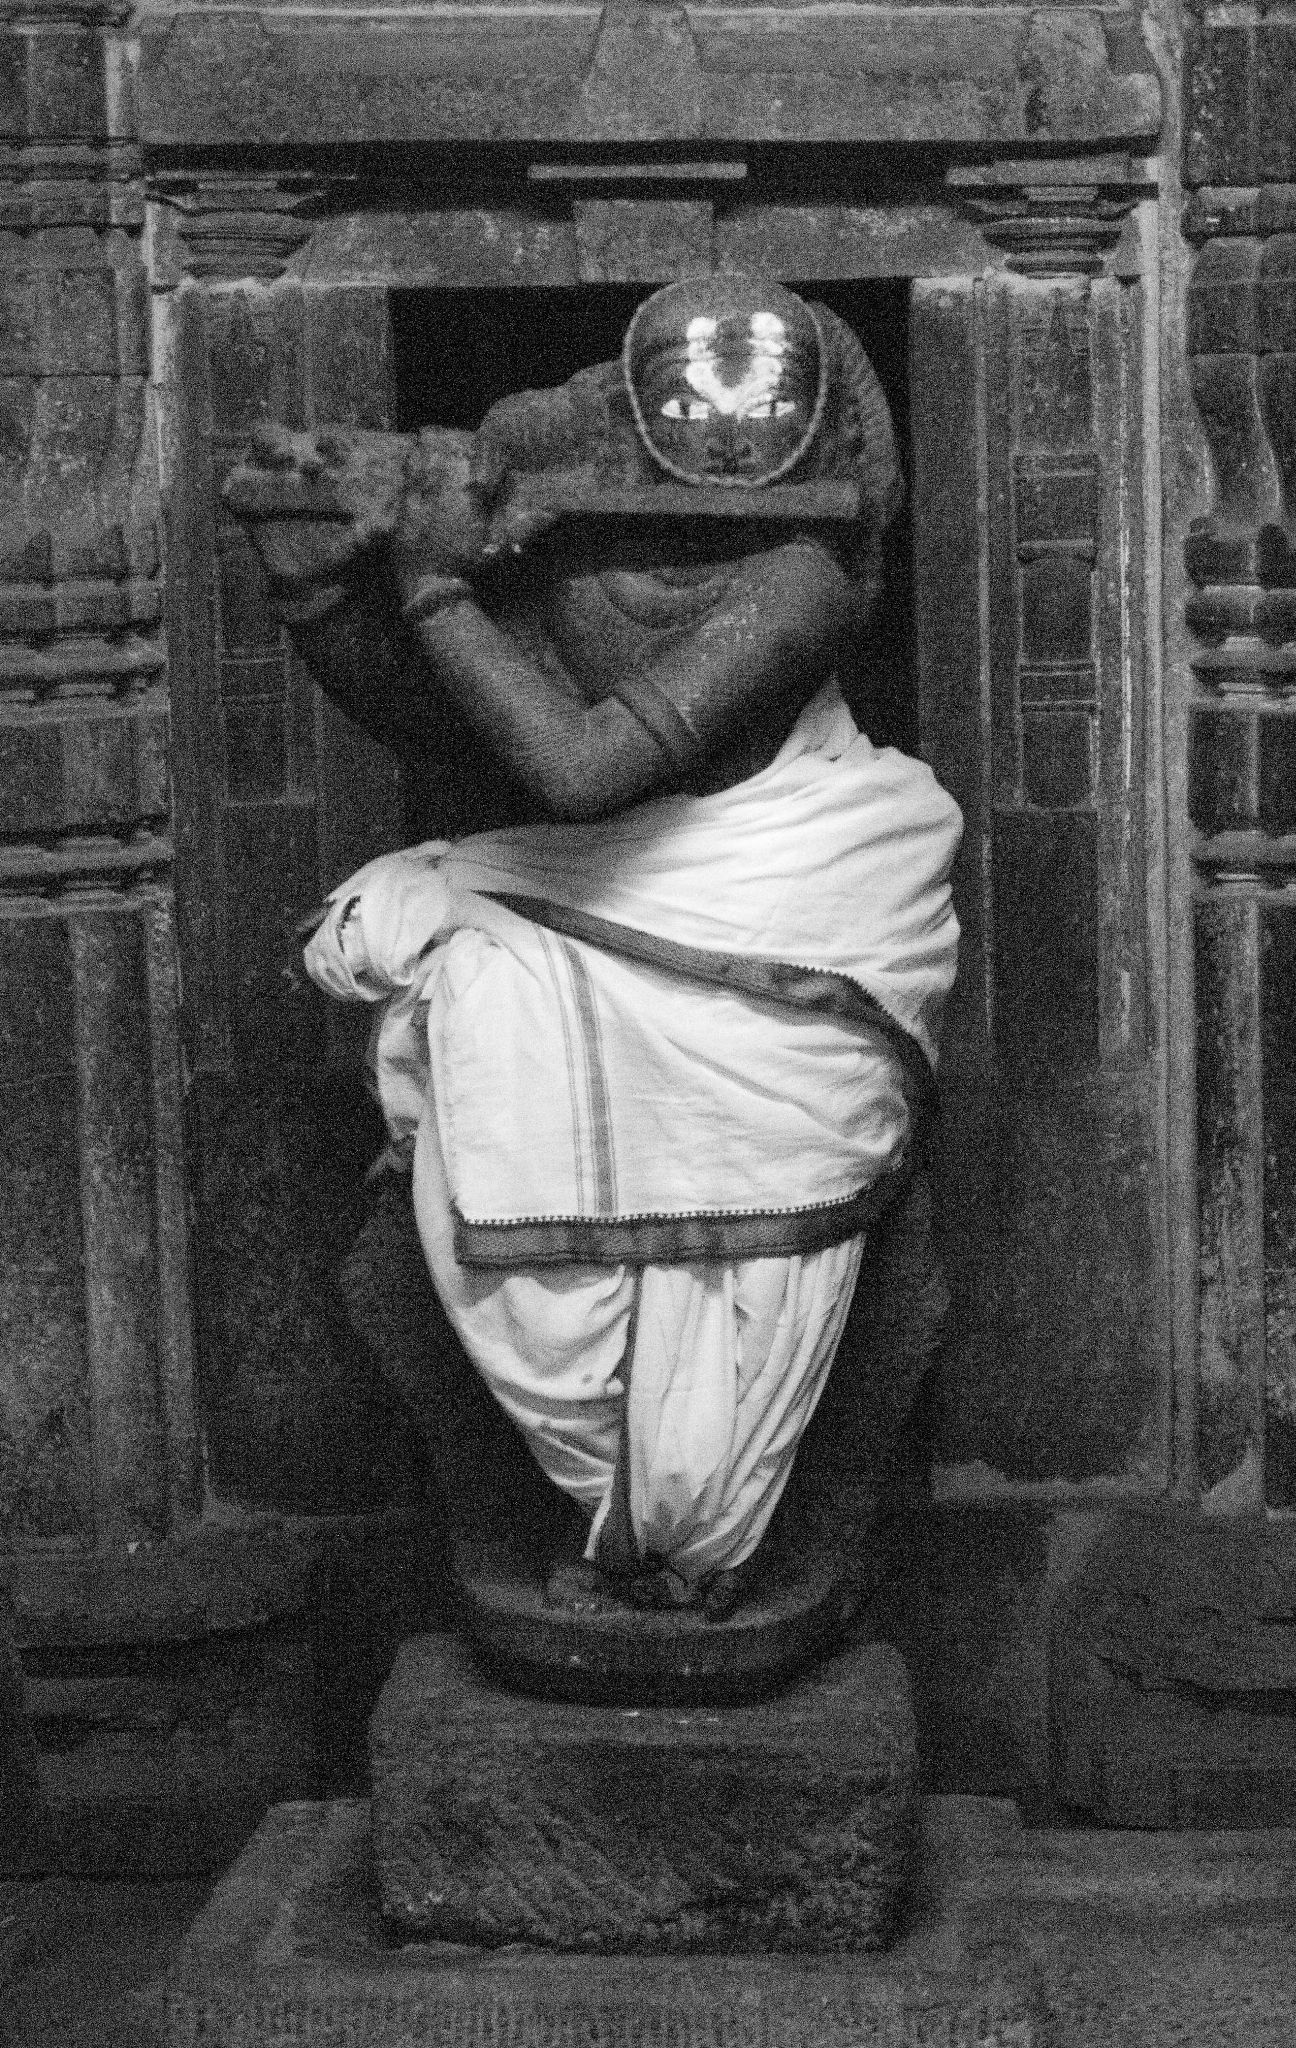 Krishna at Belur Temple by prashanth r